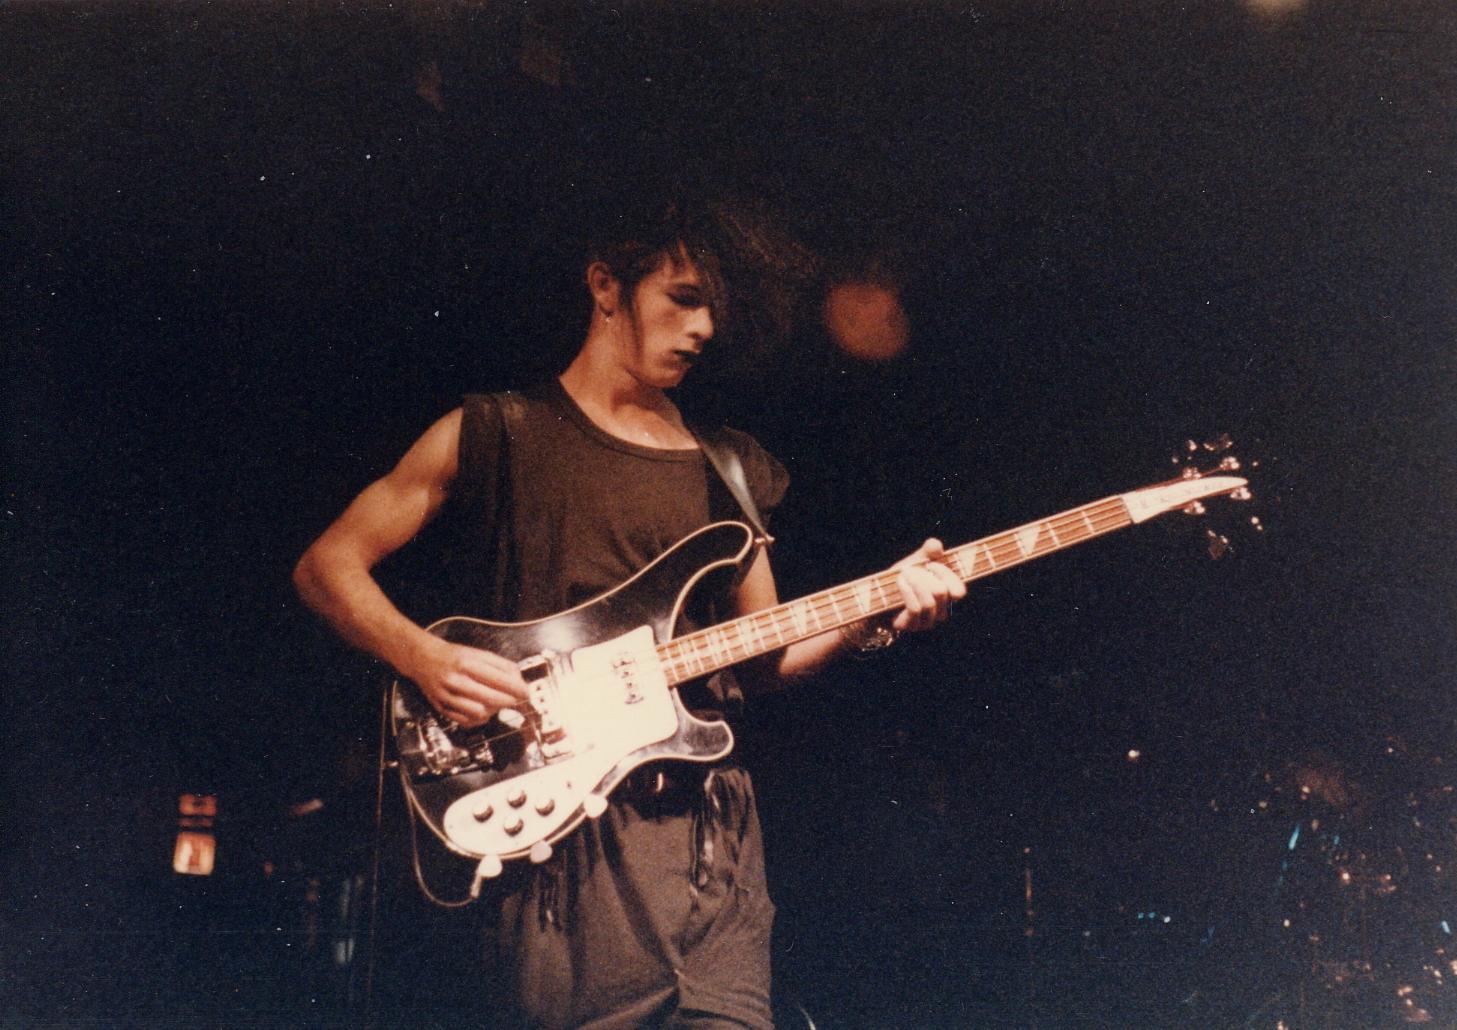 1985-08-12 (34)